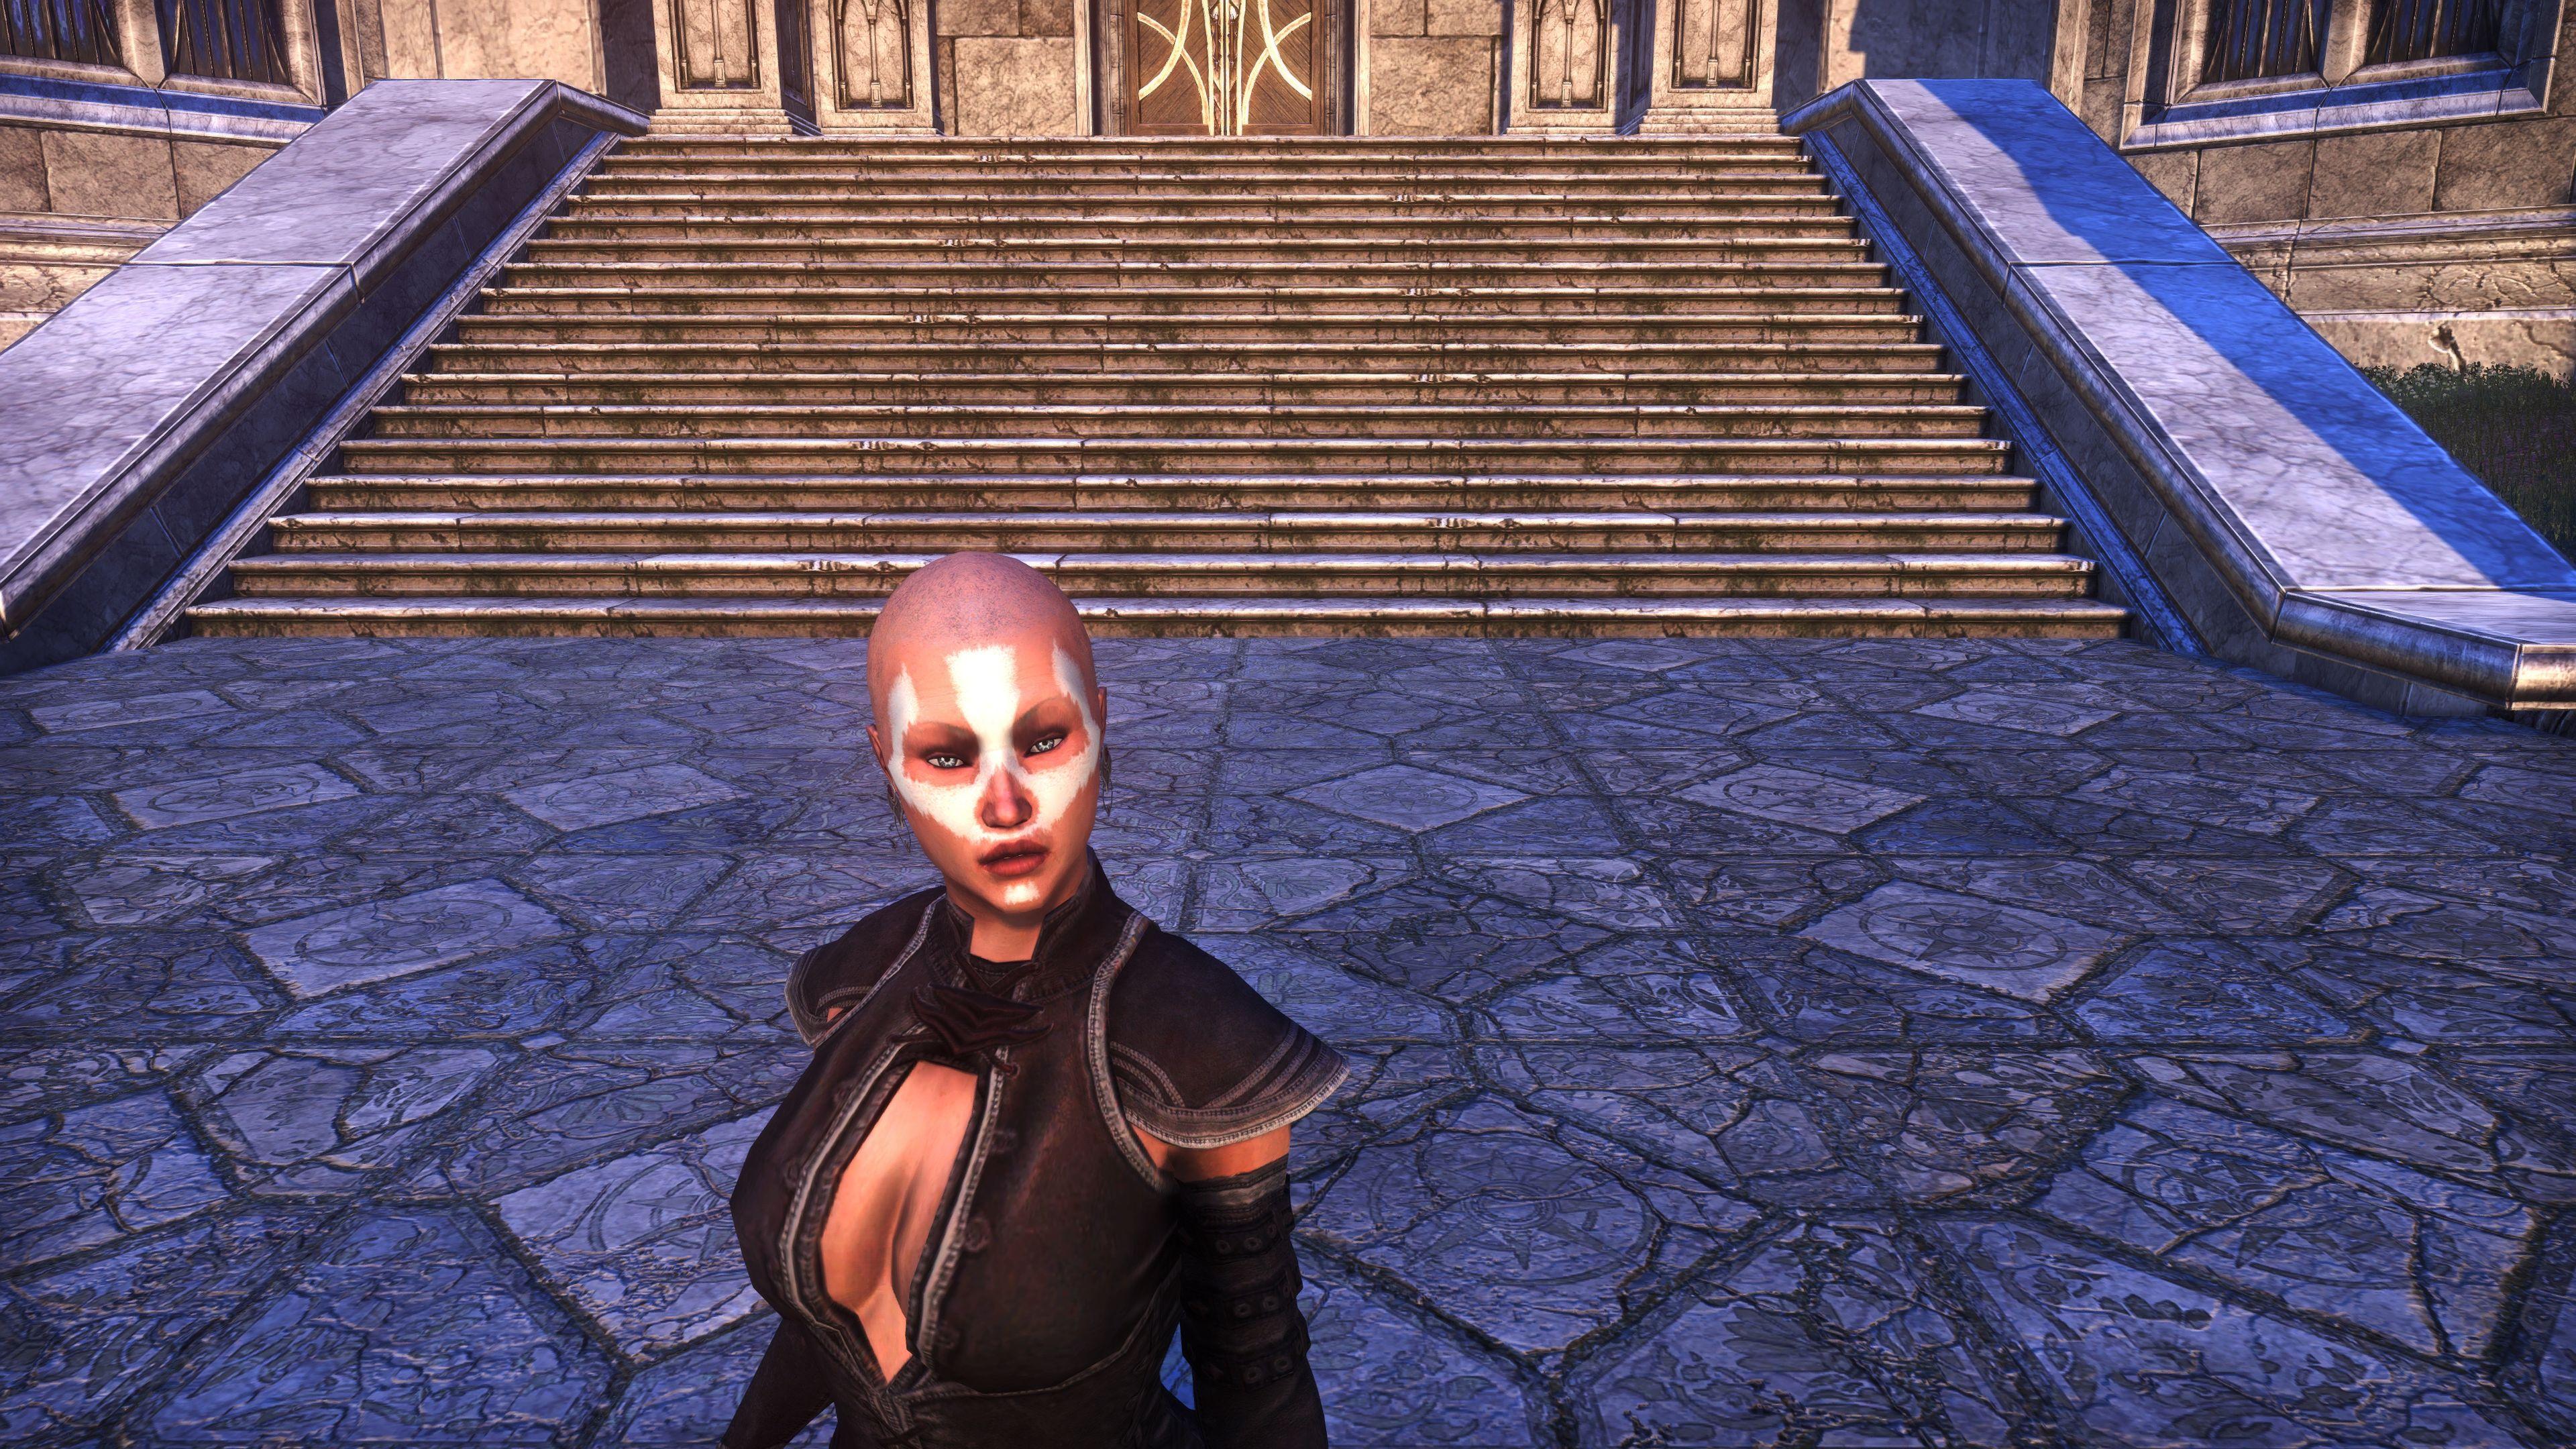 Ghost Goblin Face War Paint (Appearance > Face Markings), Psijic Vault Crate, The Elder Scrolls Online